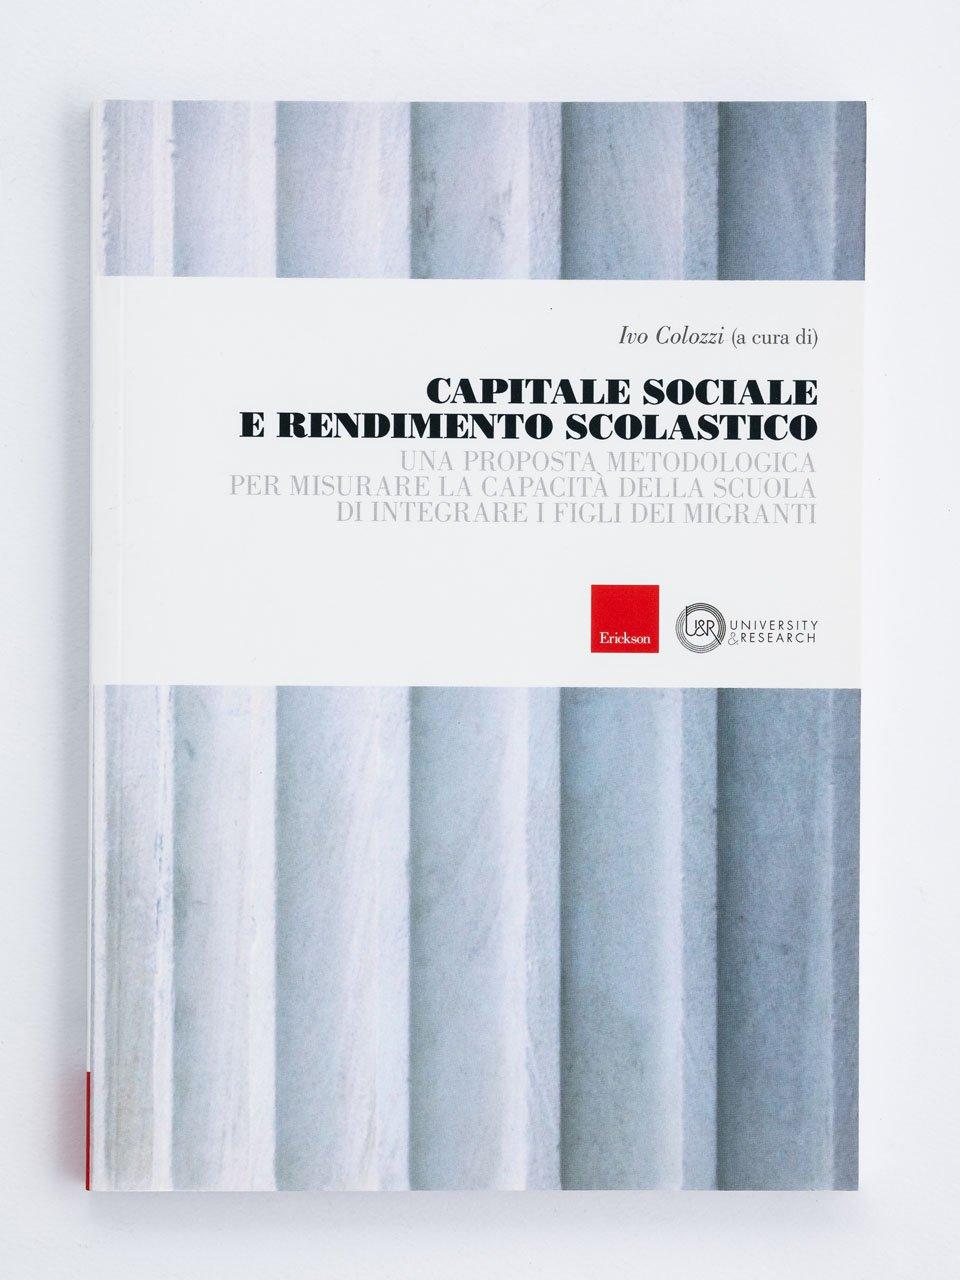 Capitale sociale e rendimento scolastico - Career counseling - Libri - Erickson